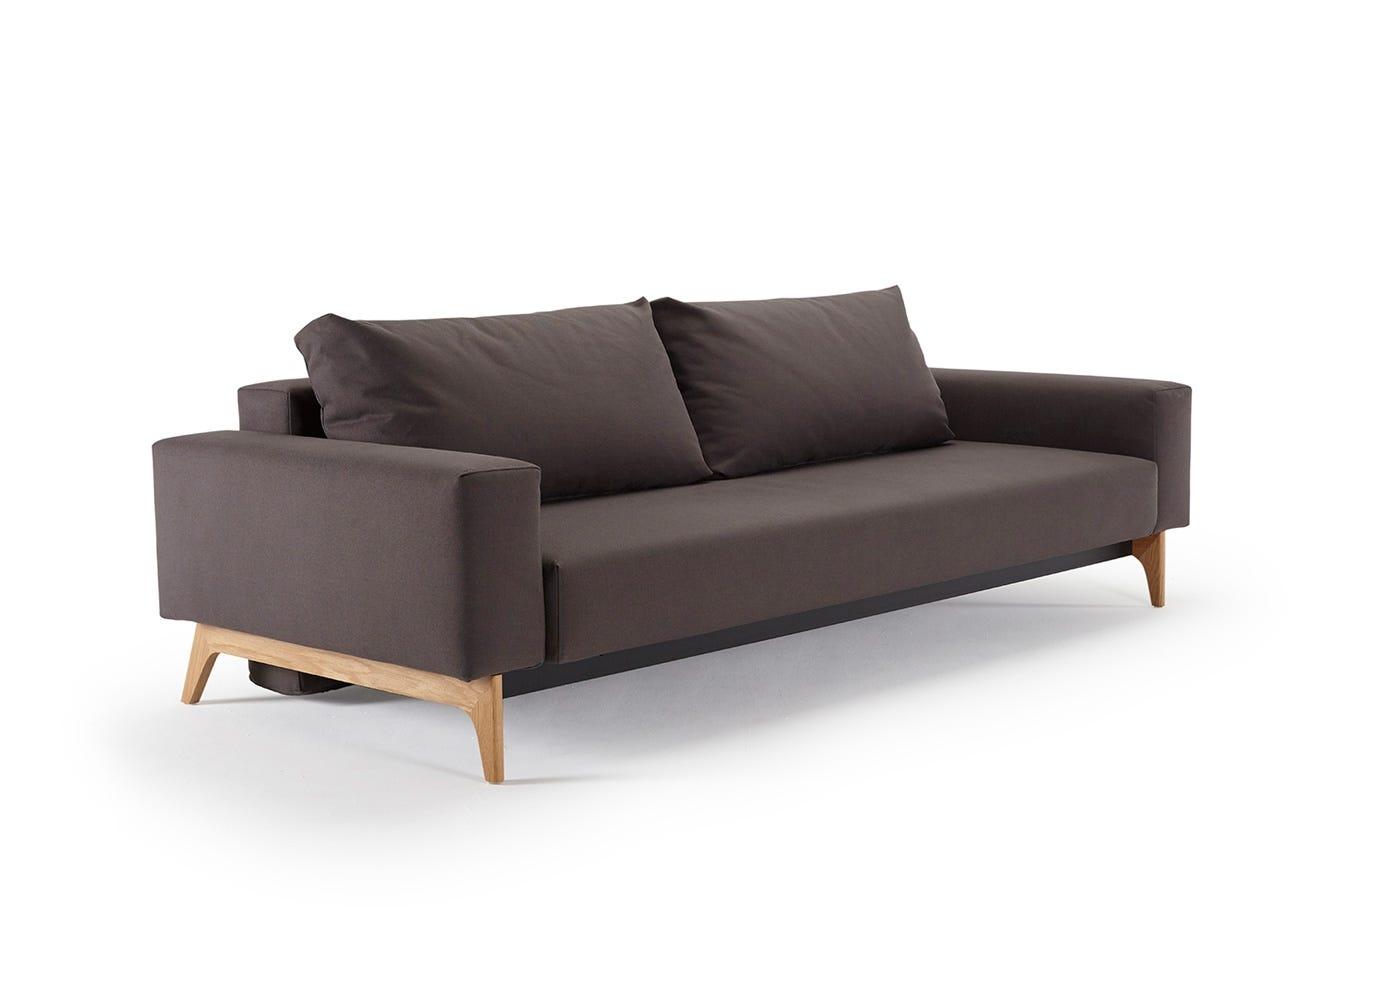 Beige Sofa Bed Bonita Springs Beige Sleeper Sofa Sofas